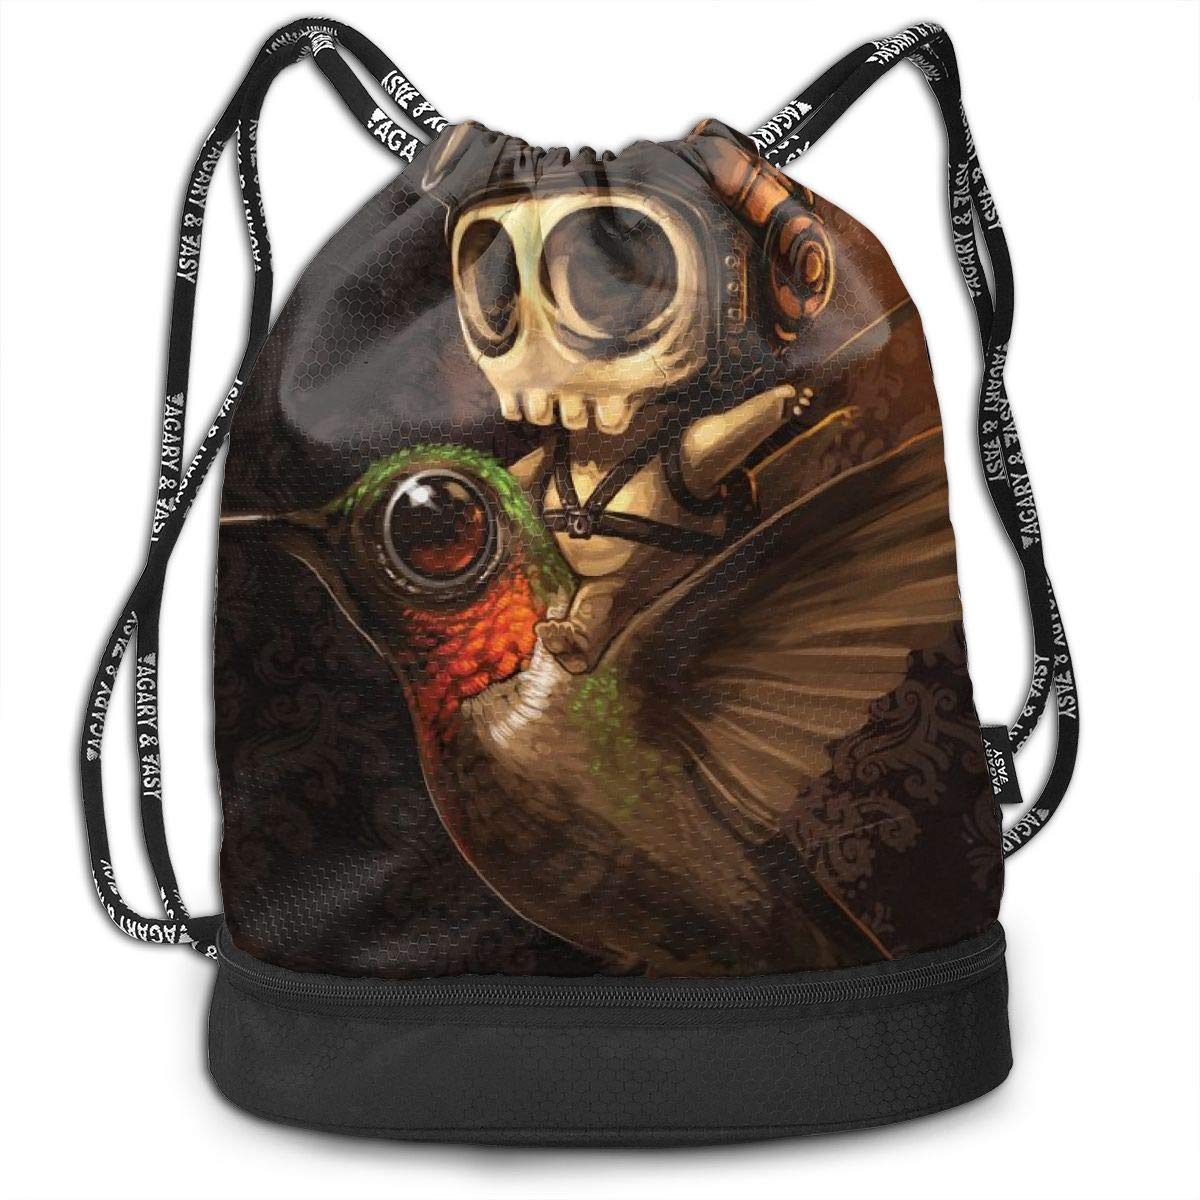 Cute Skeleton Hummingbird Graphics Drawstring Bag For Girls /& Boys Portable Bundle Backpack Gym Yoga Runner Sports Daypack